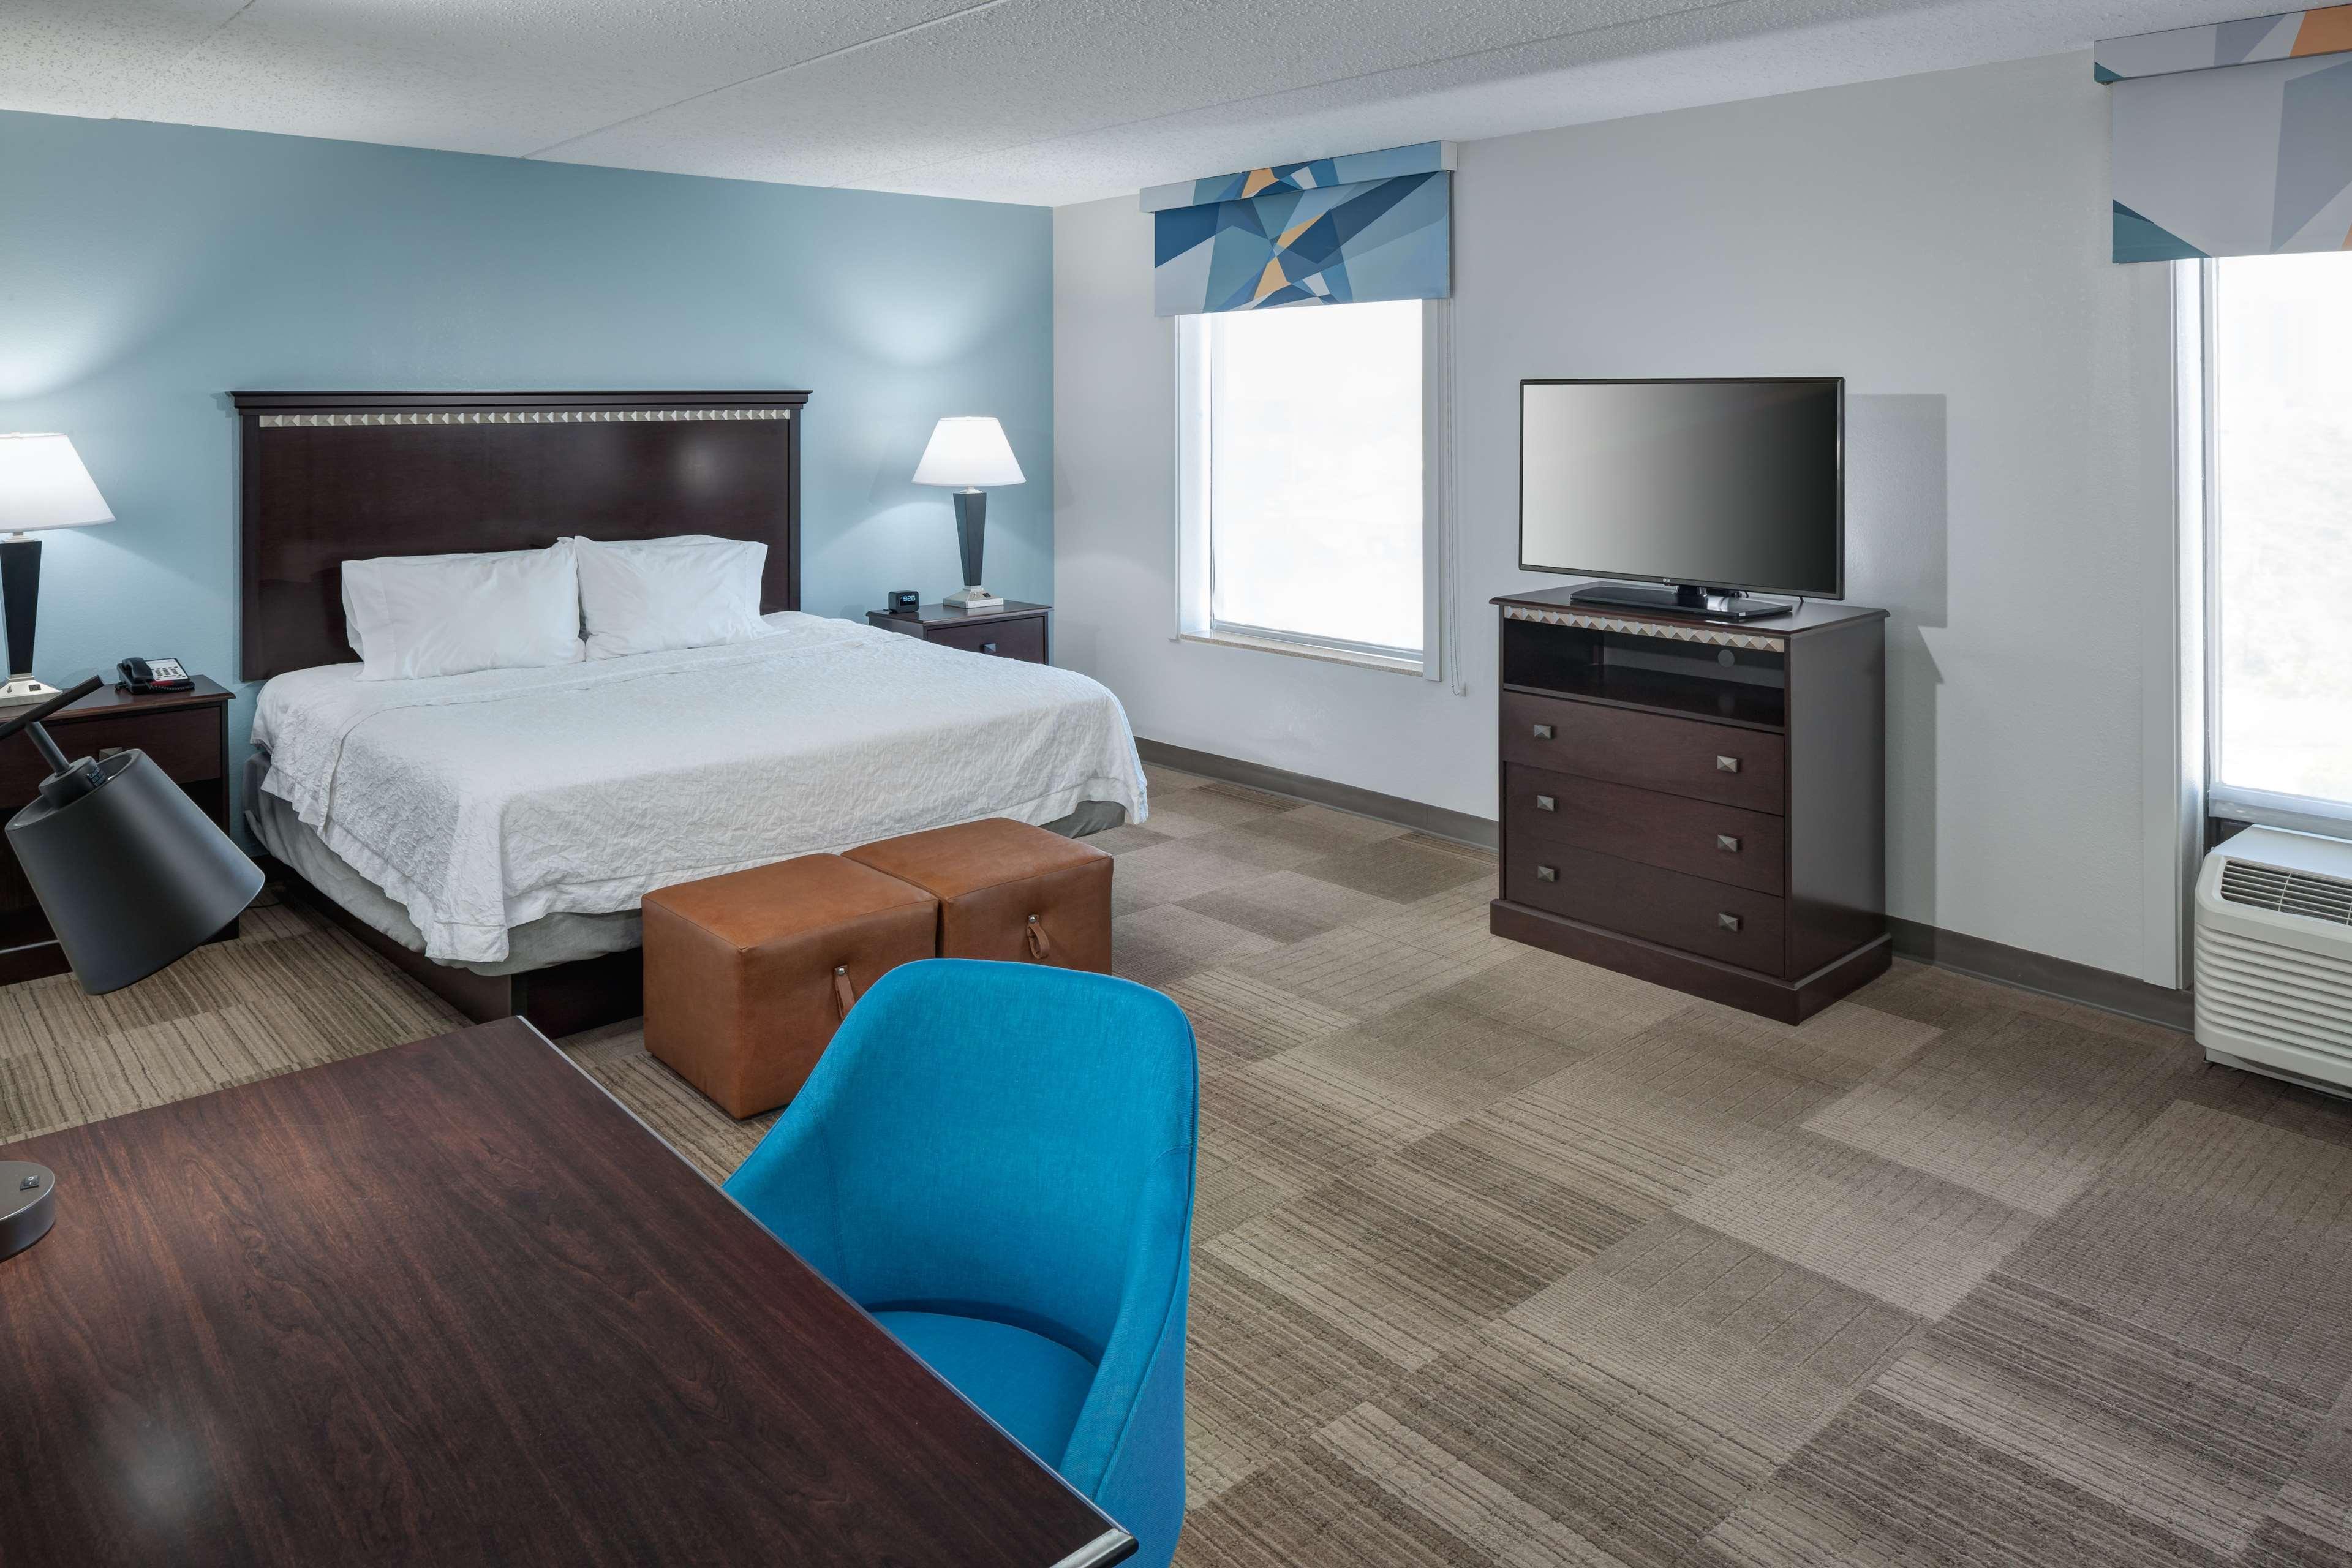 Hampton Inn & Suites Panama City Beach-Pier Park Area image 15